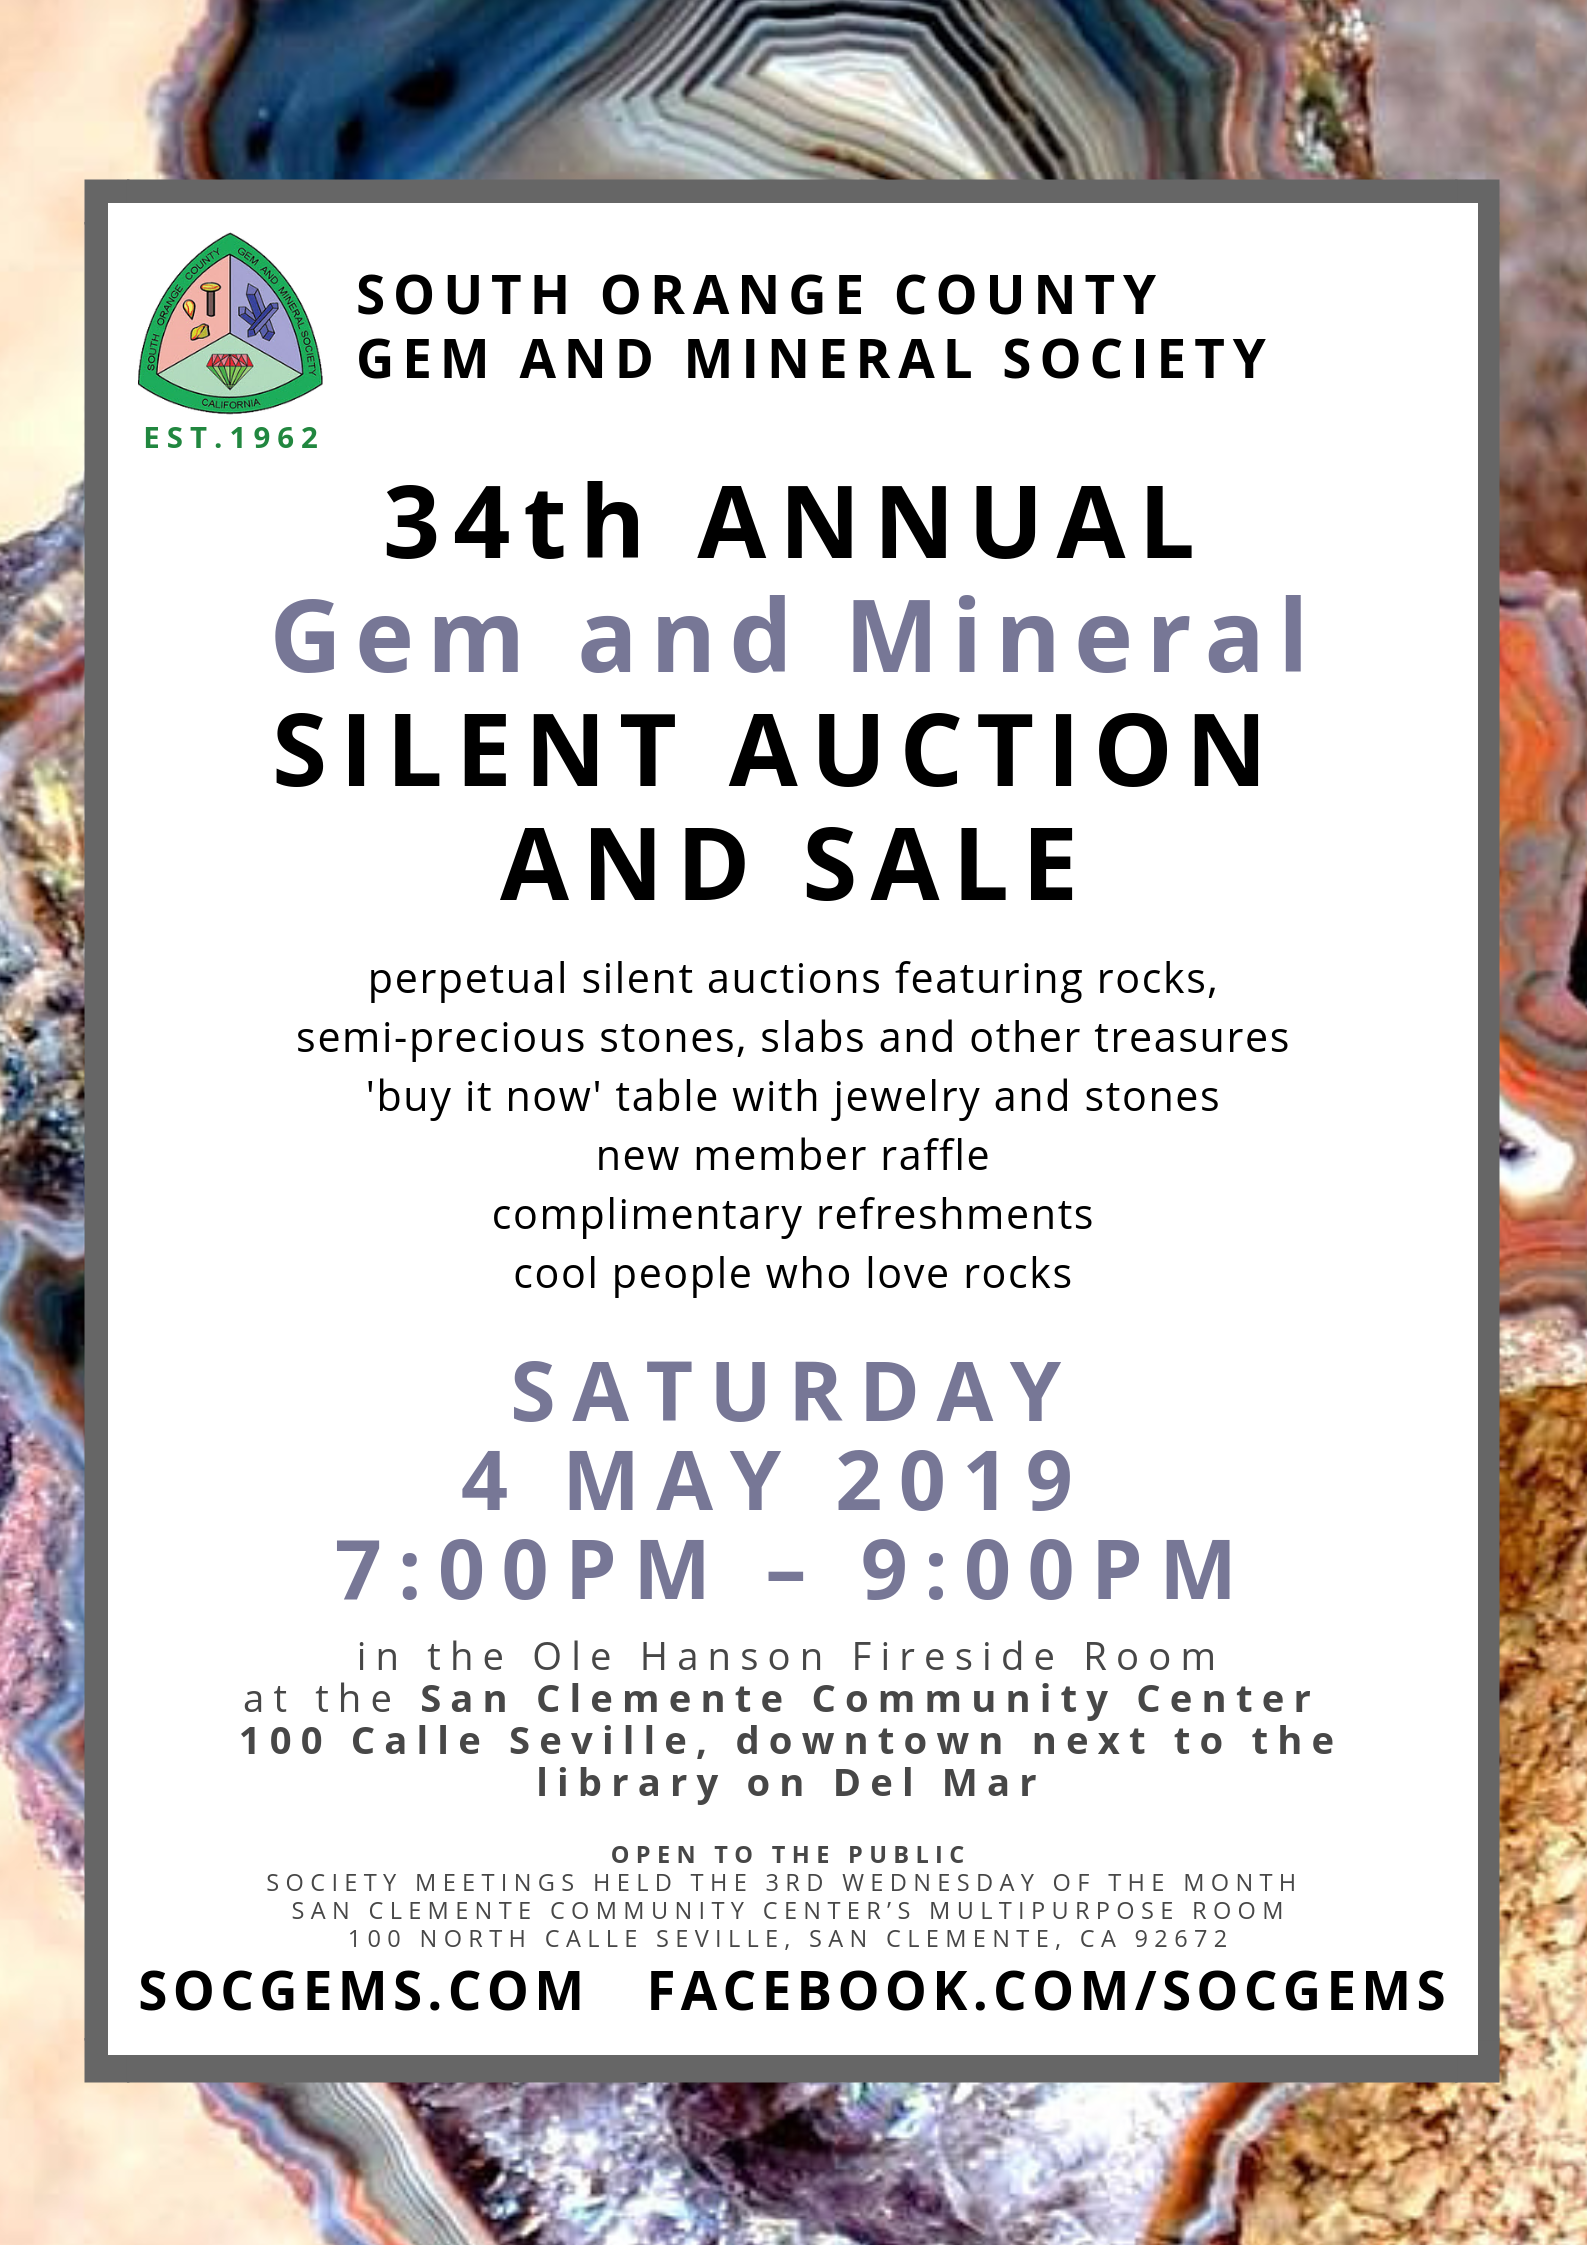 SOCGEMS annual silent auction